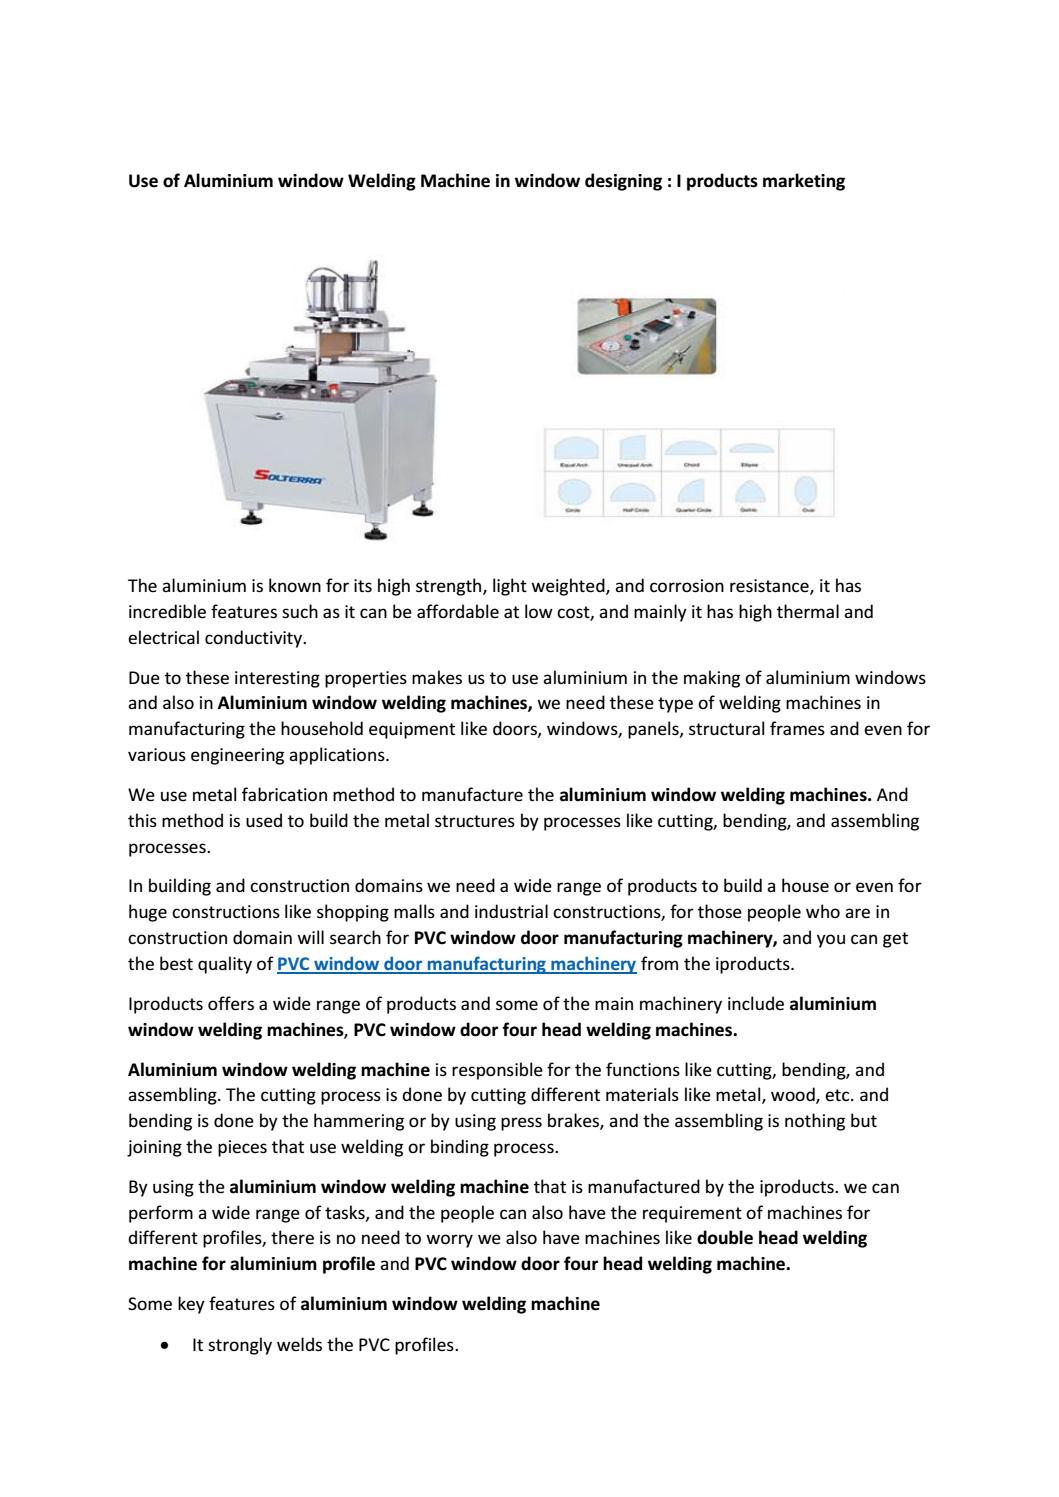 Use of Aluminium window Welding Machine in window designing